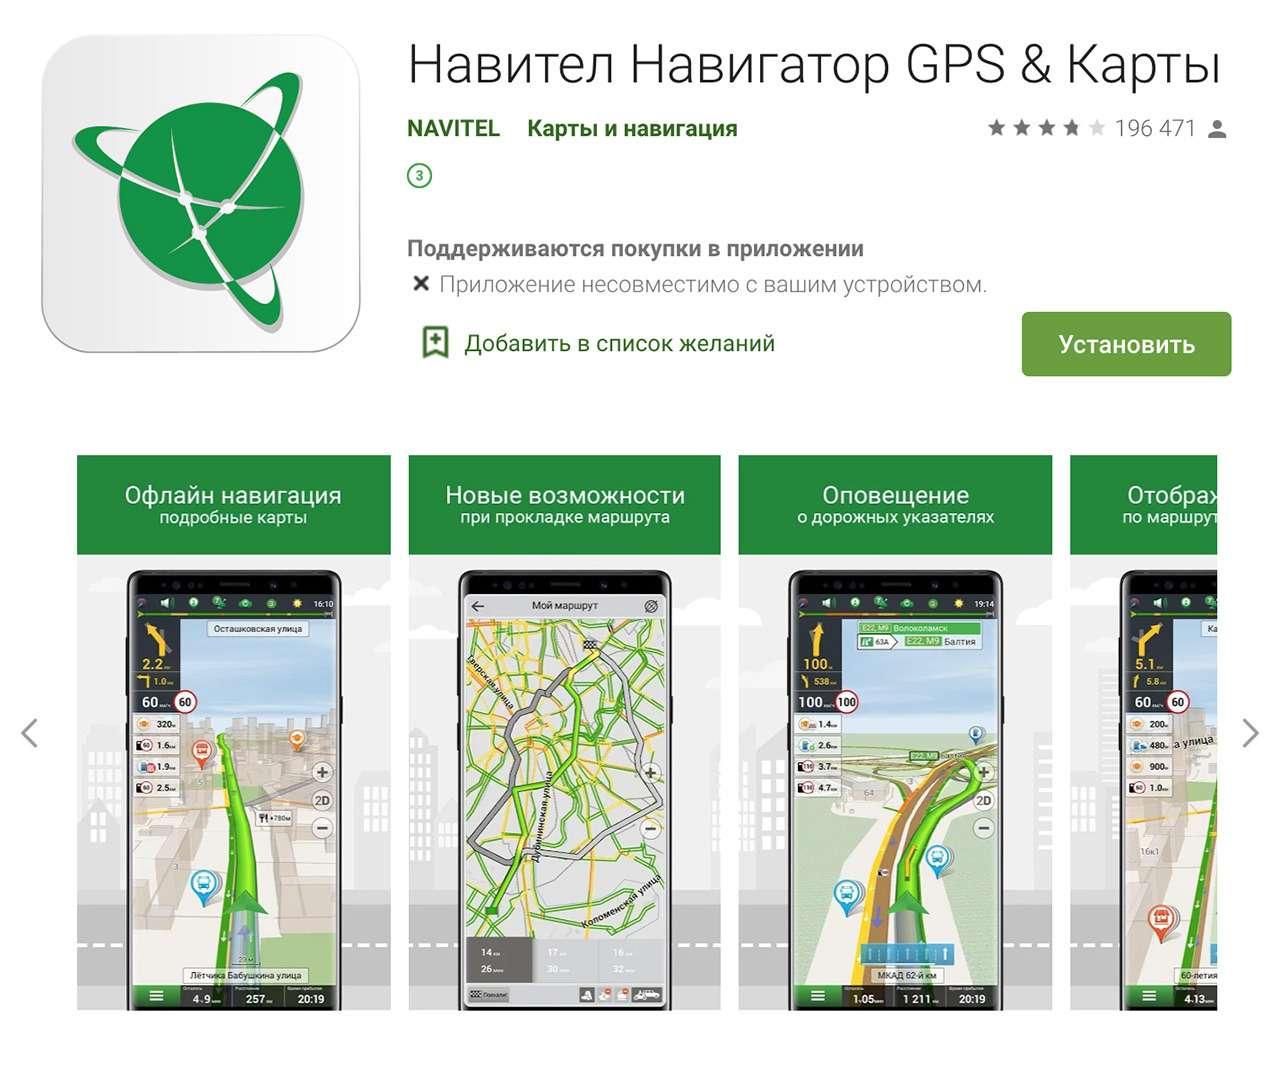 6 альтернатив Яндекс.Навигатору. Выберите свою— фото 1195241